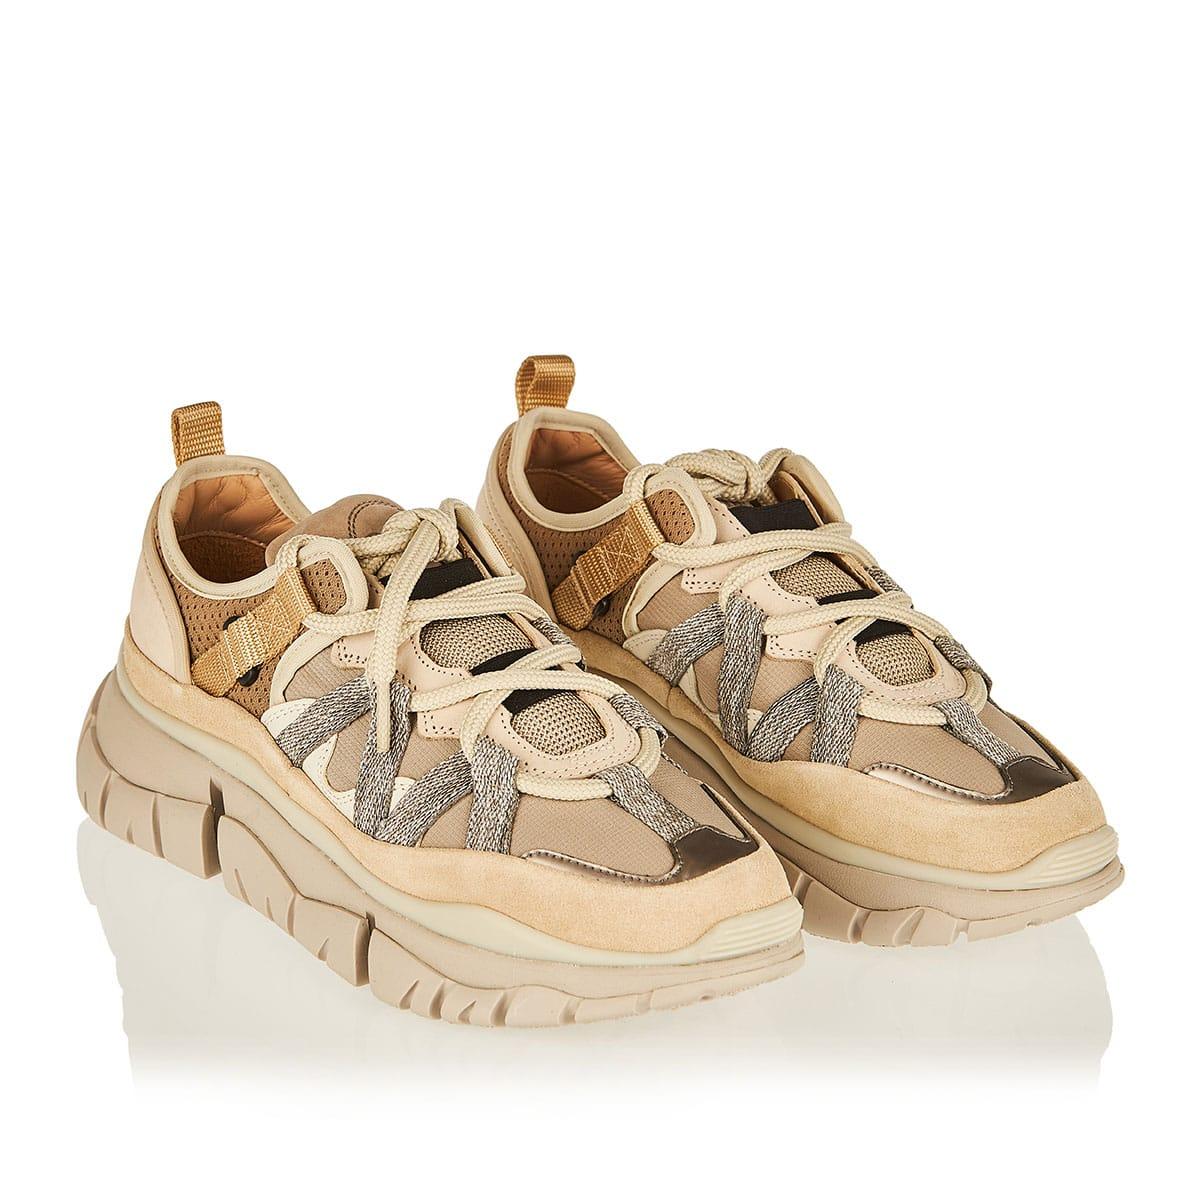 Blake chunky sneakers